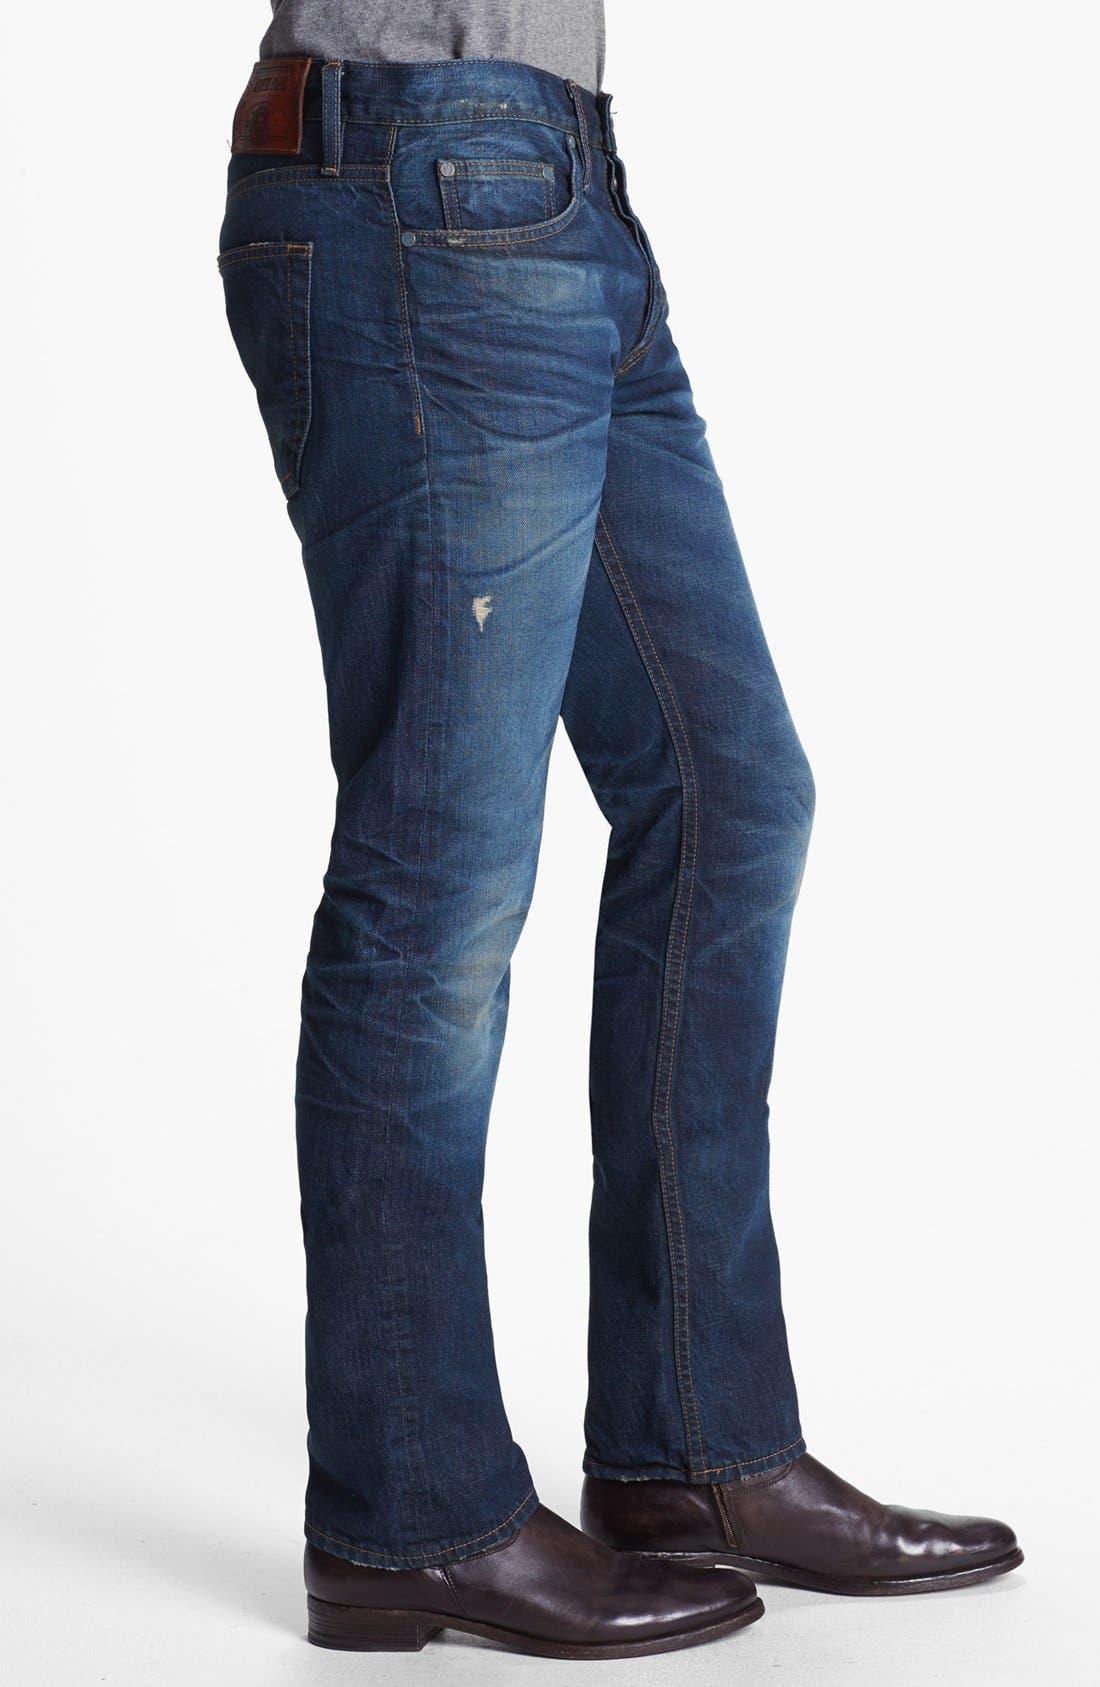 Alternate Image 2  - Asbury Park '1874 Monte Carlo' Straight Leg Selvedge Jeans (Ocean Grove)